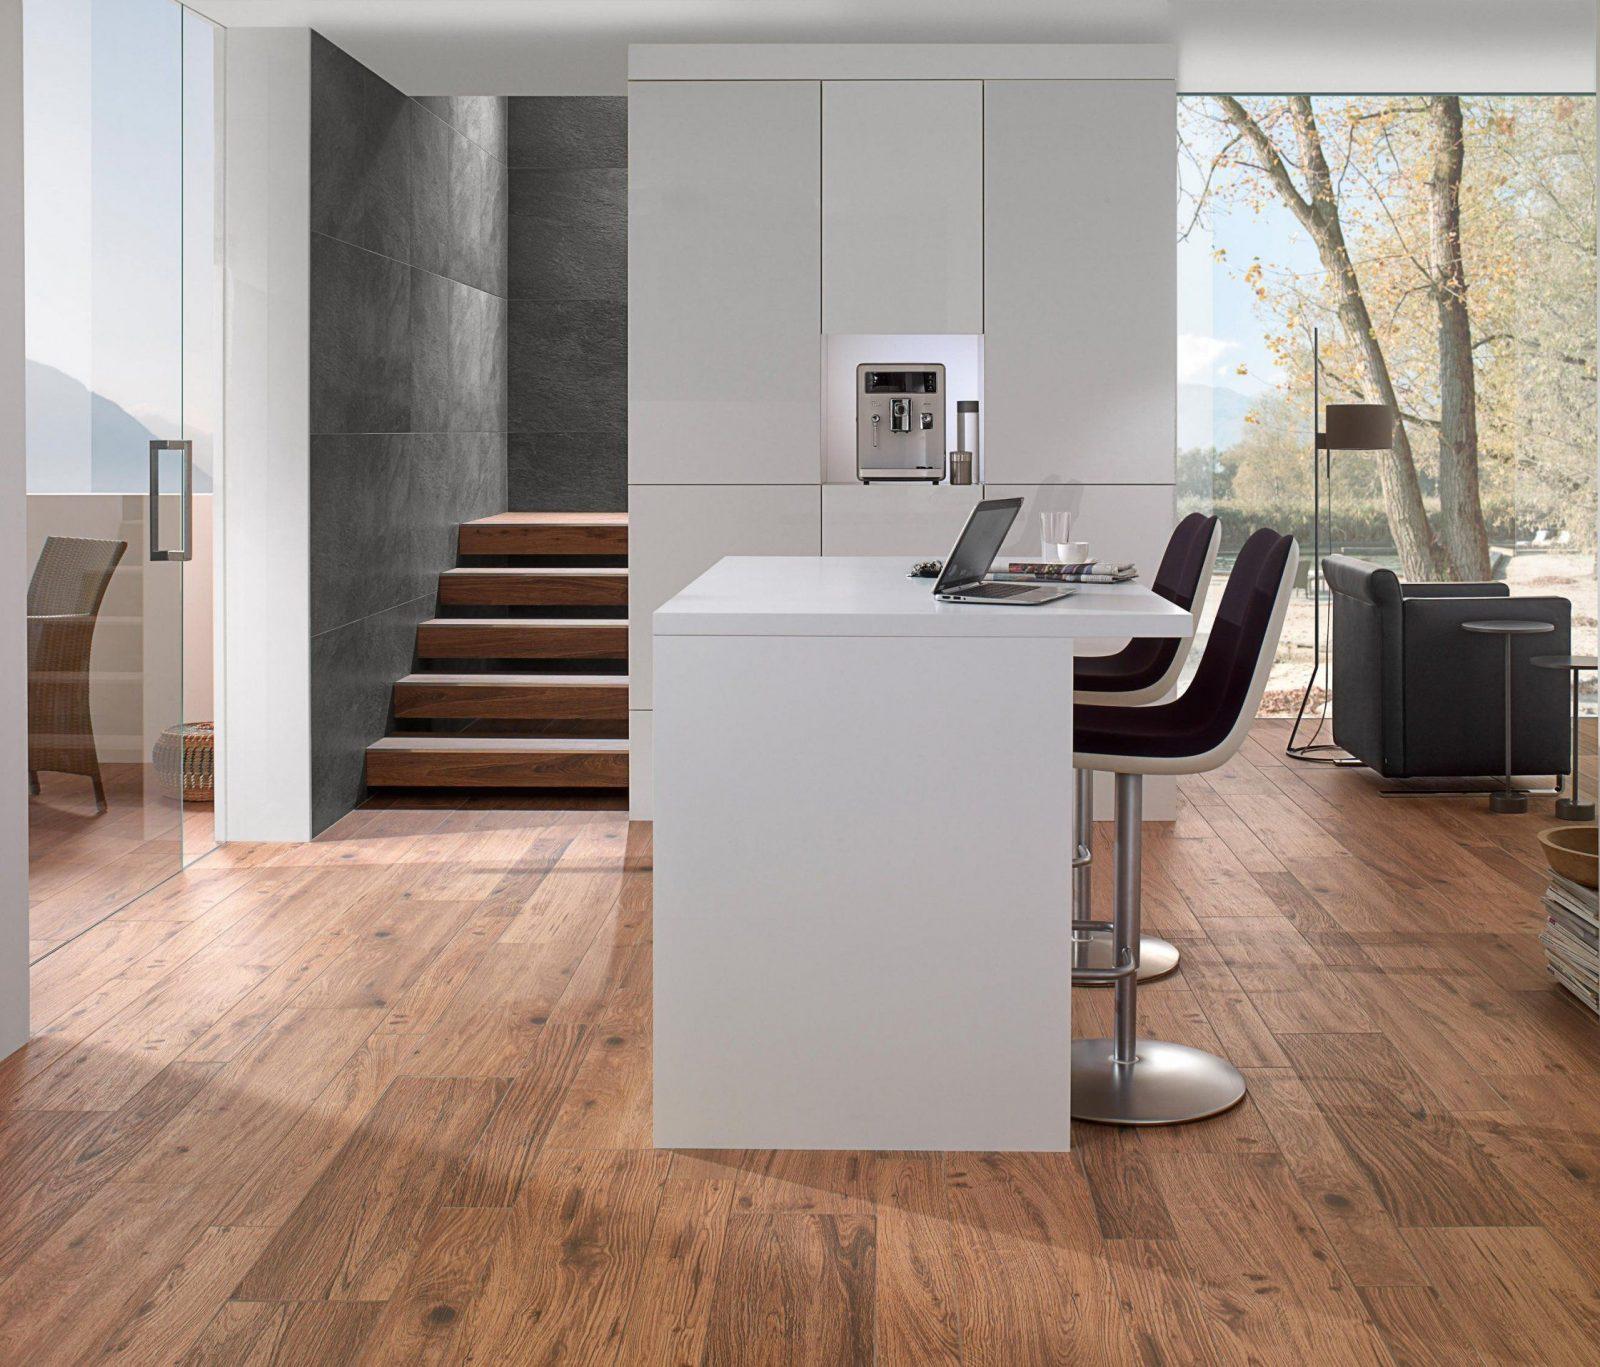 New Lodge Hw10 Tiles From Villeroy Boch Fliesen Architonic – Homemaison von Fliesen Holzoptik Villeroy Boch Bild